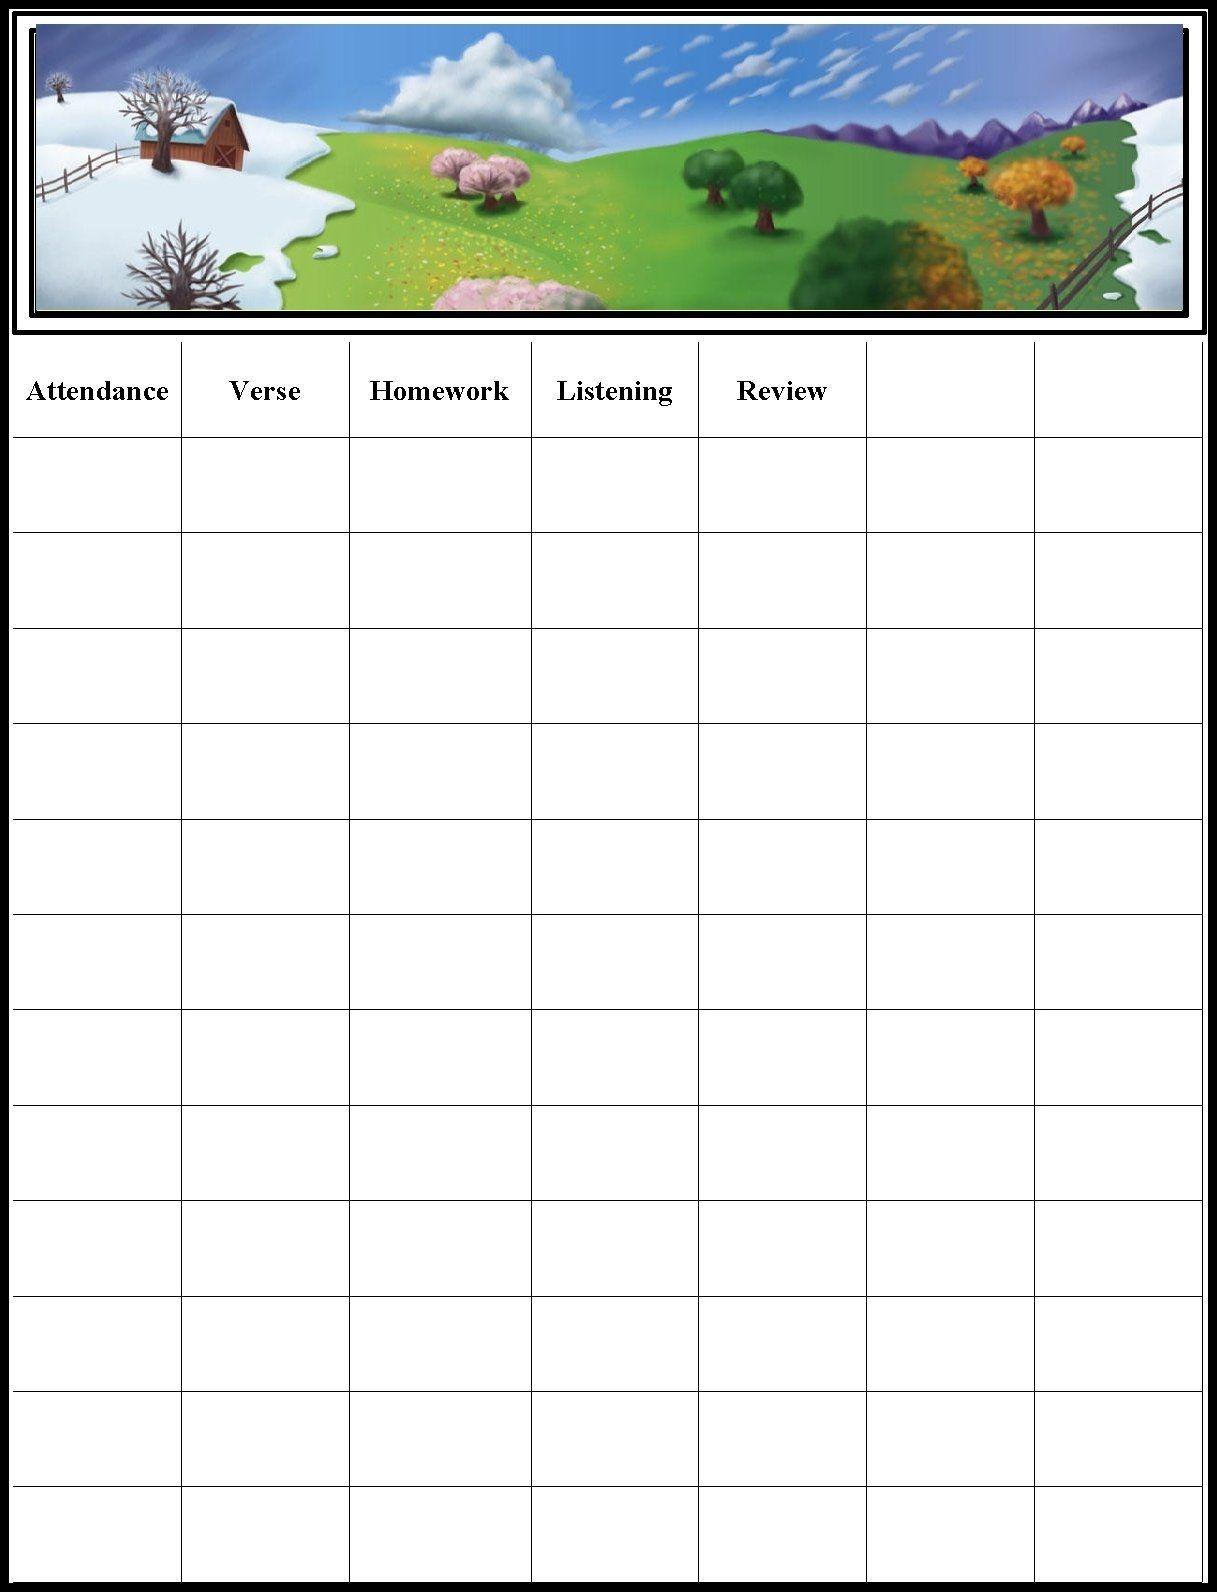 Childrens Gems In My Treasure Box: Sunday School - Attendance Chart - Sunday School Attendance Chart Free Printable